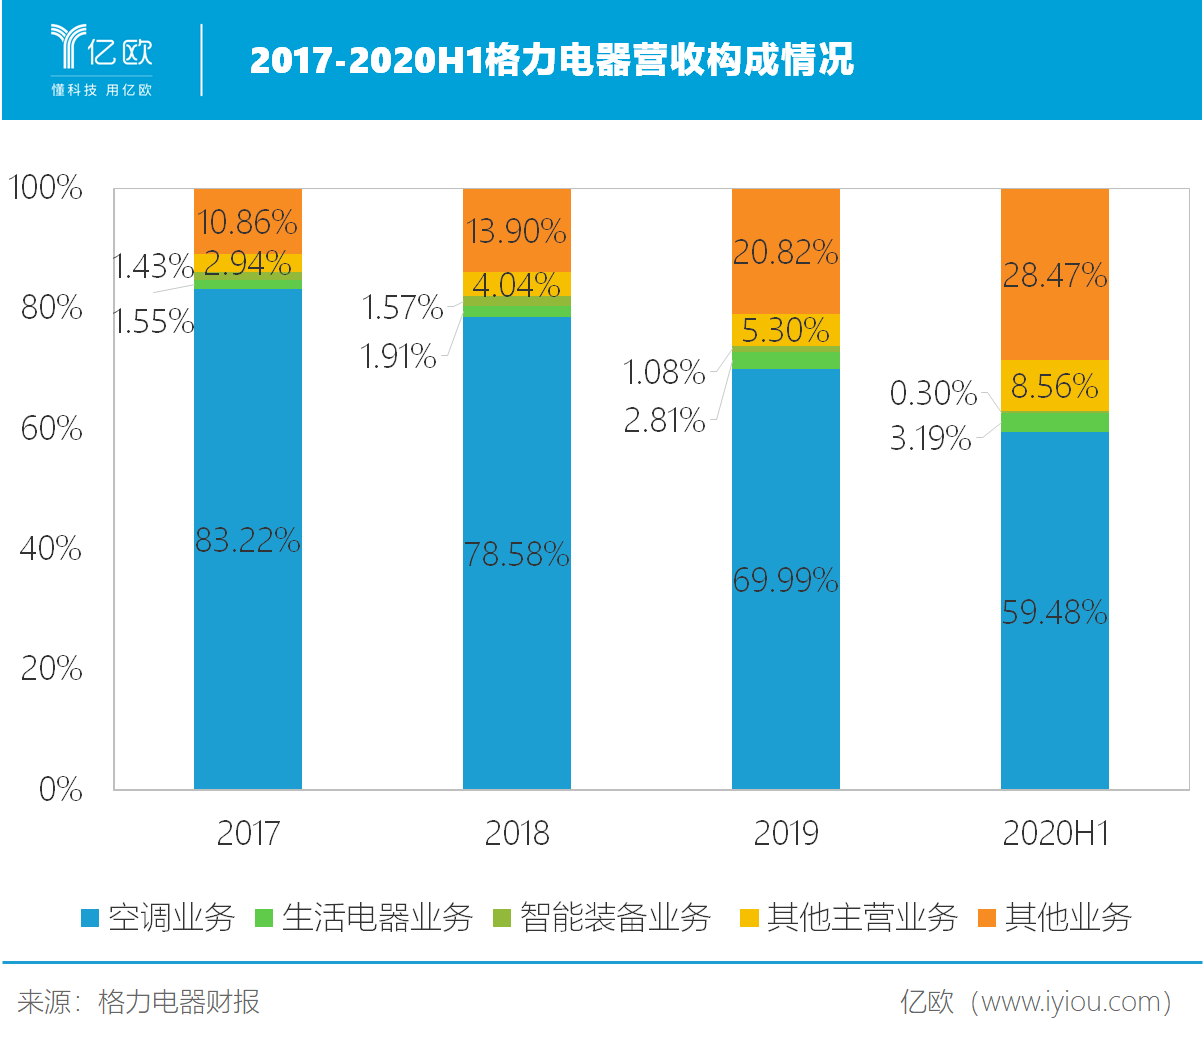 2017-2020H1格力电器营收构成情况